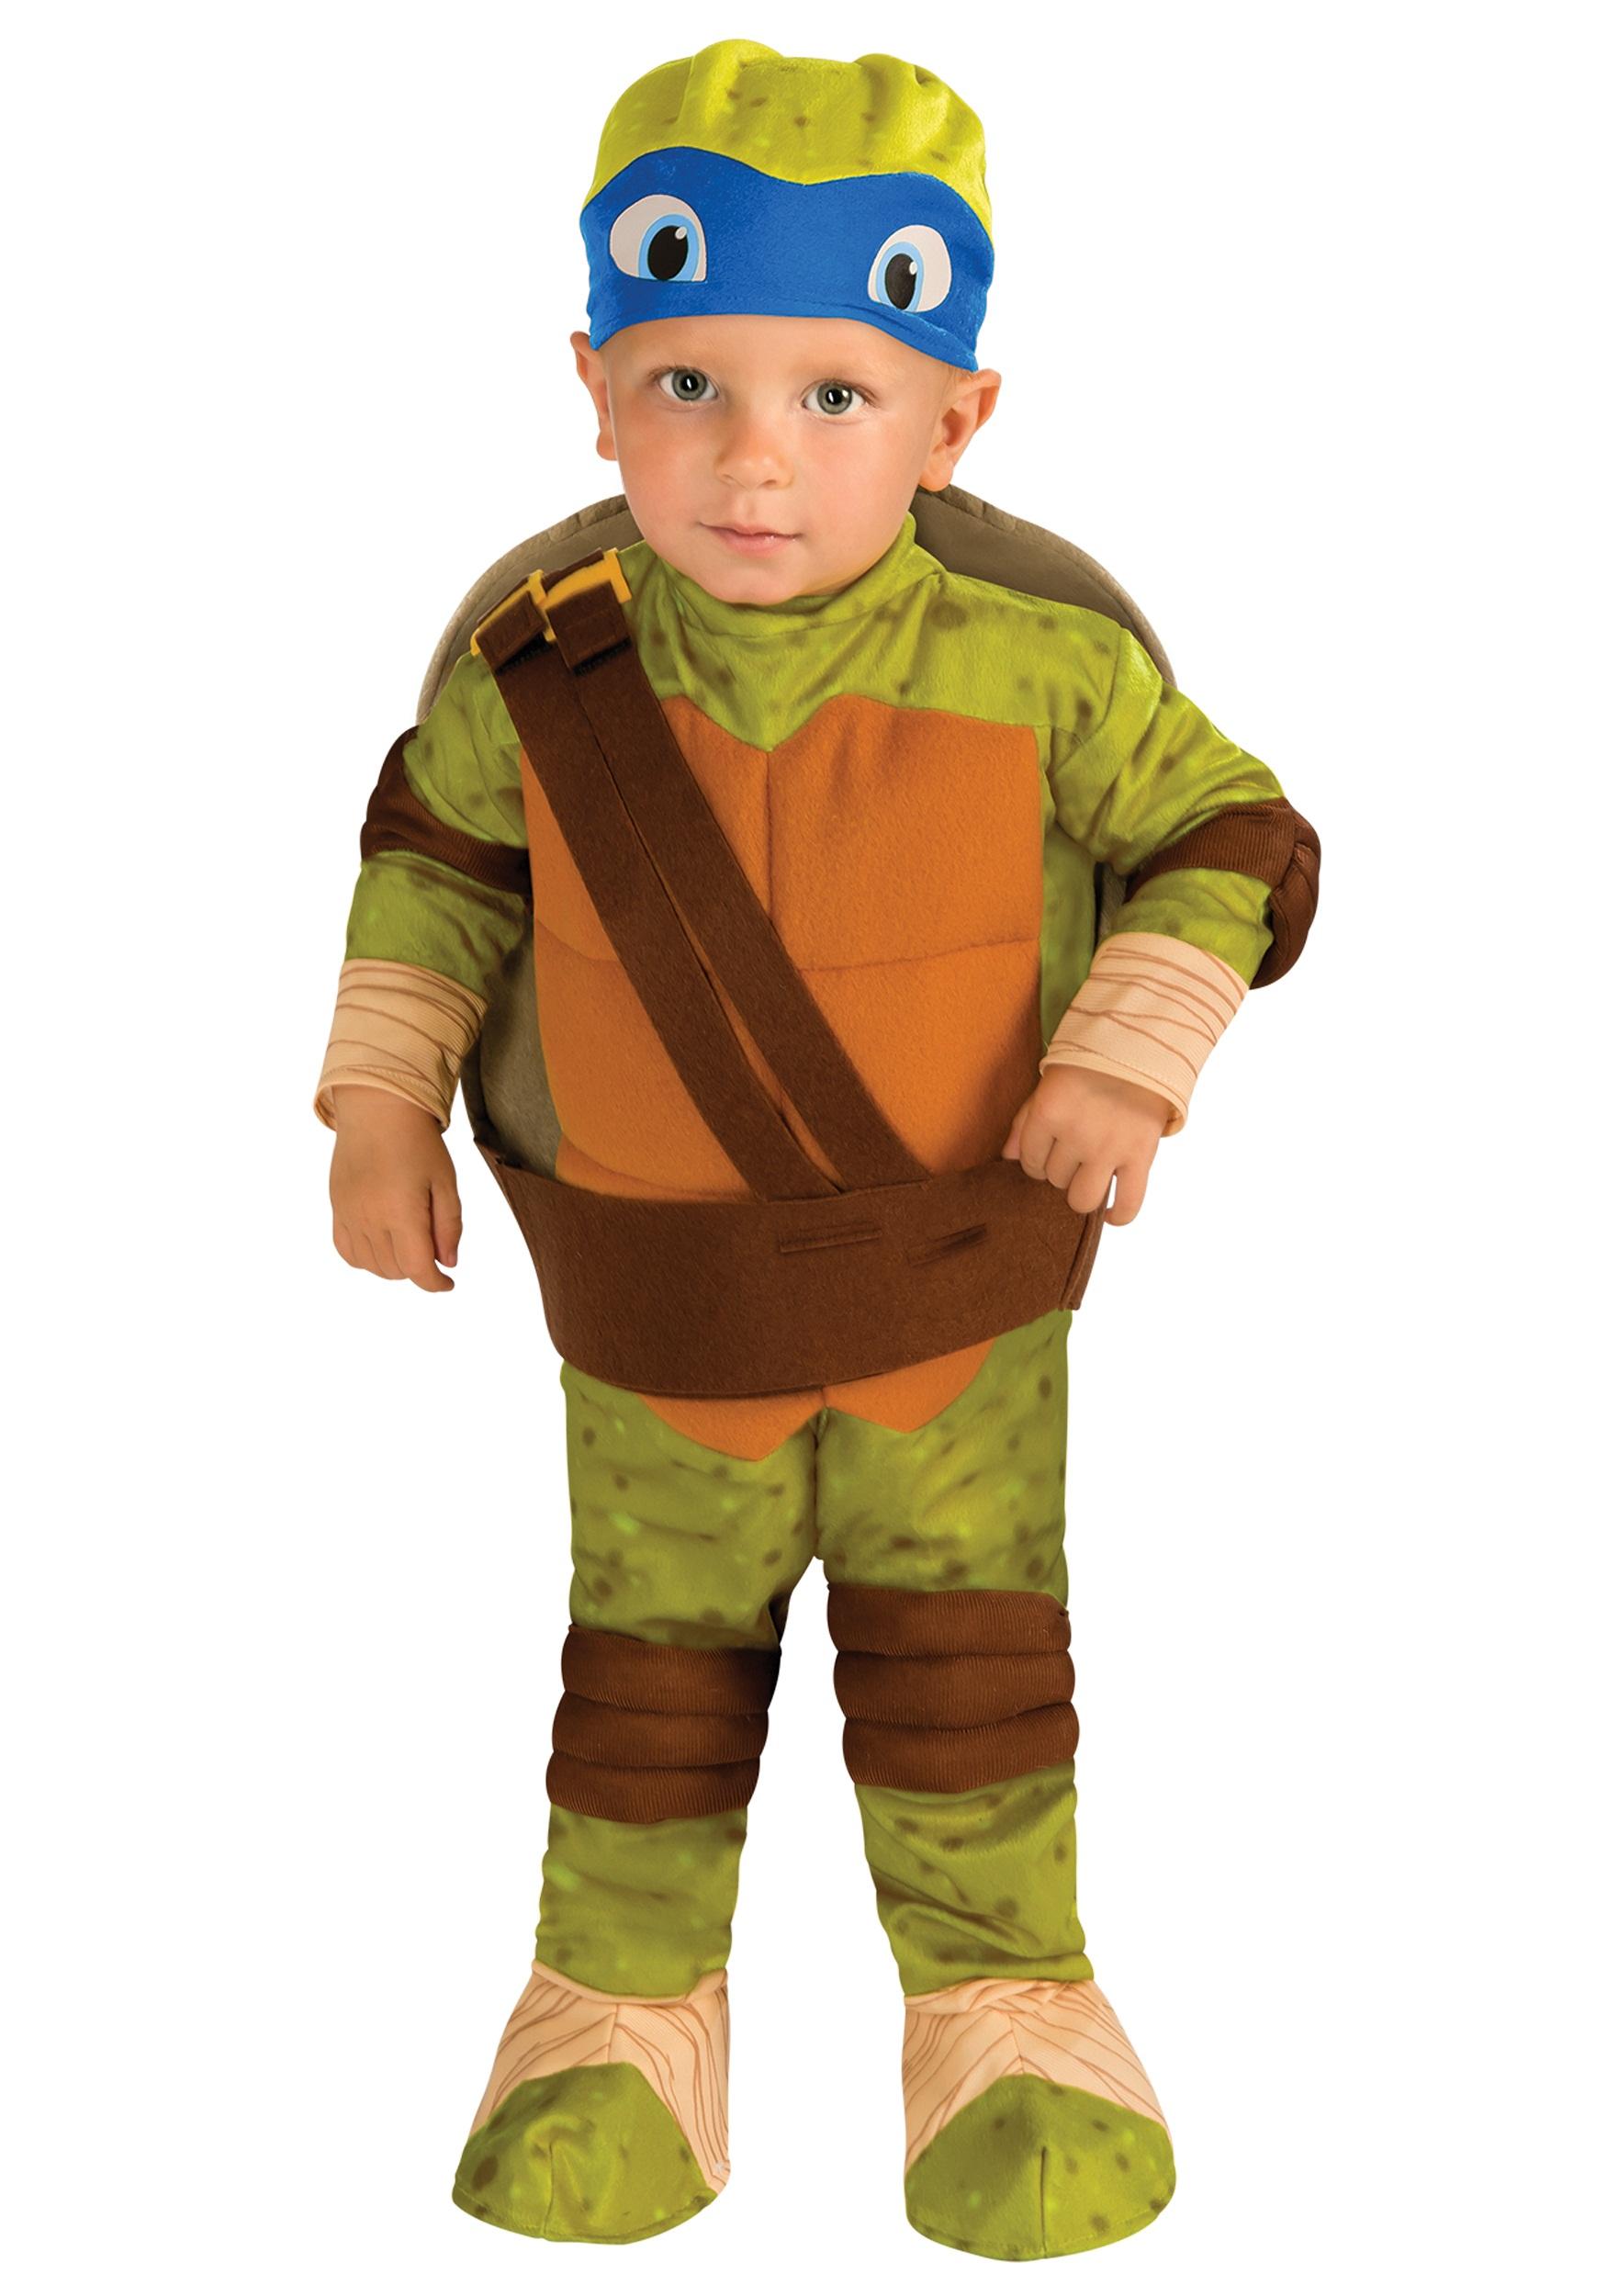 TMNT Leonardo Toddler Costume RU886781